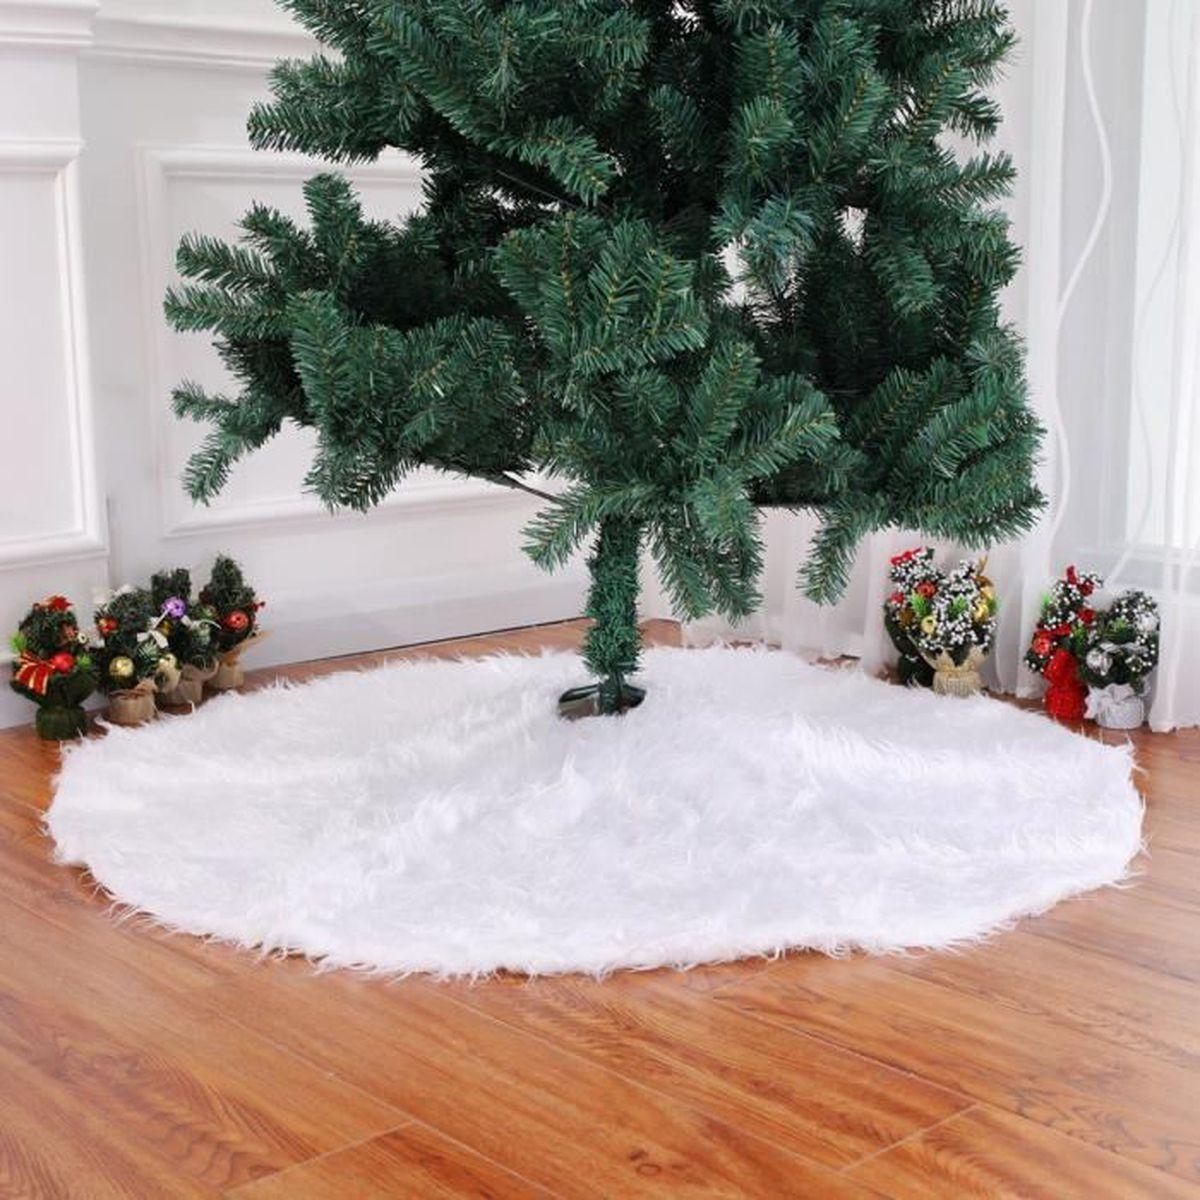 Sapin De Noel Avec Pied tapis de sapin arbre noël pied diamètre 122cm grand